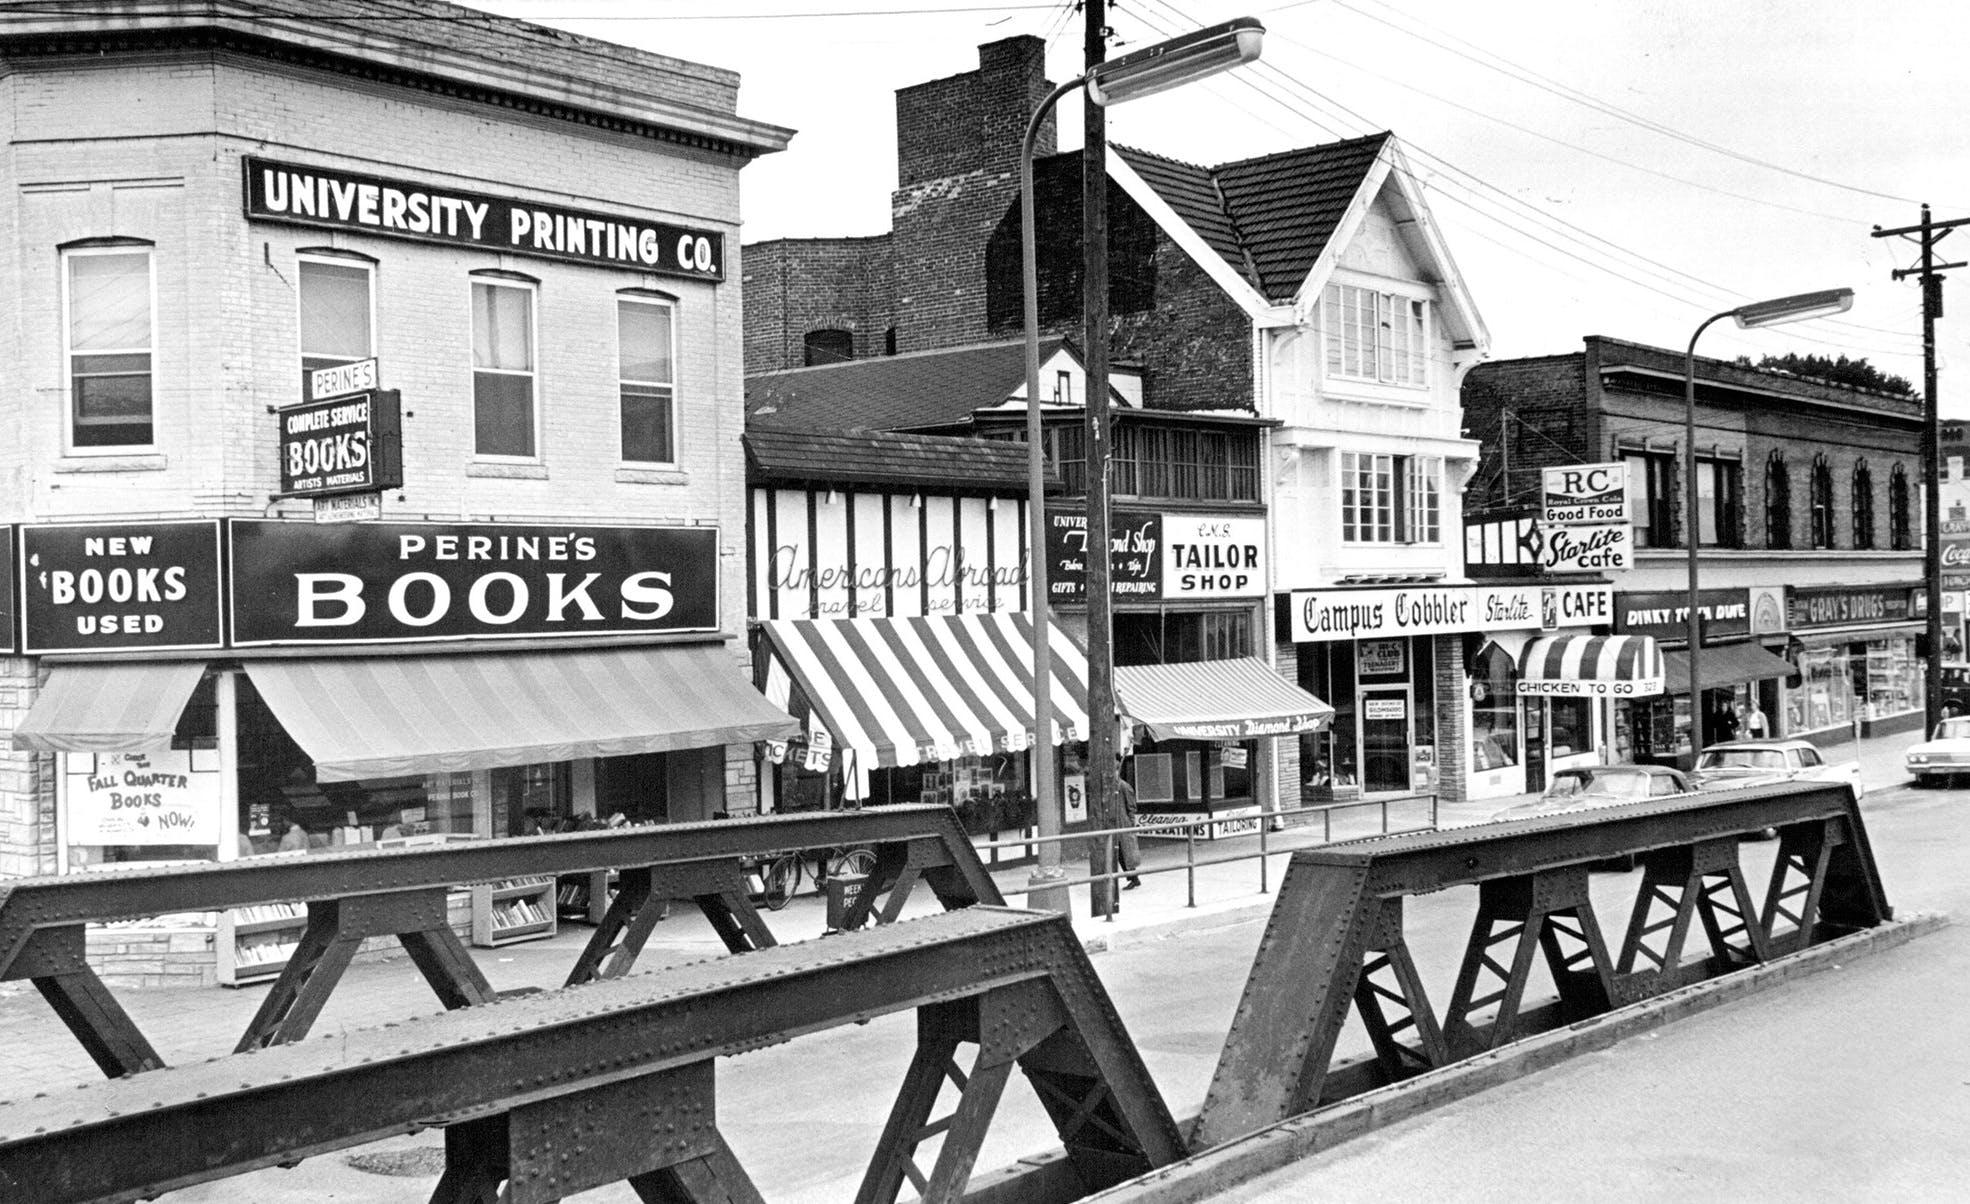 The view down 14th Avenue SE in 1963.